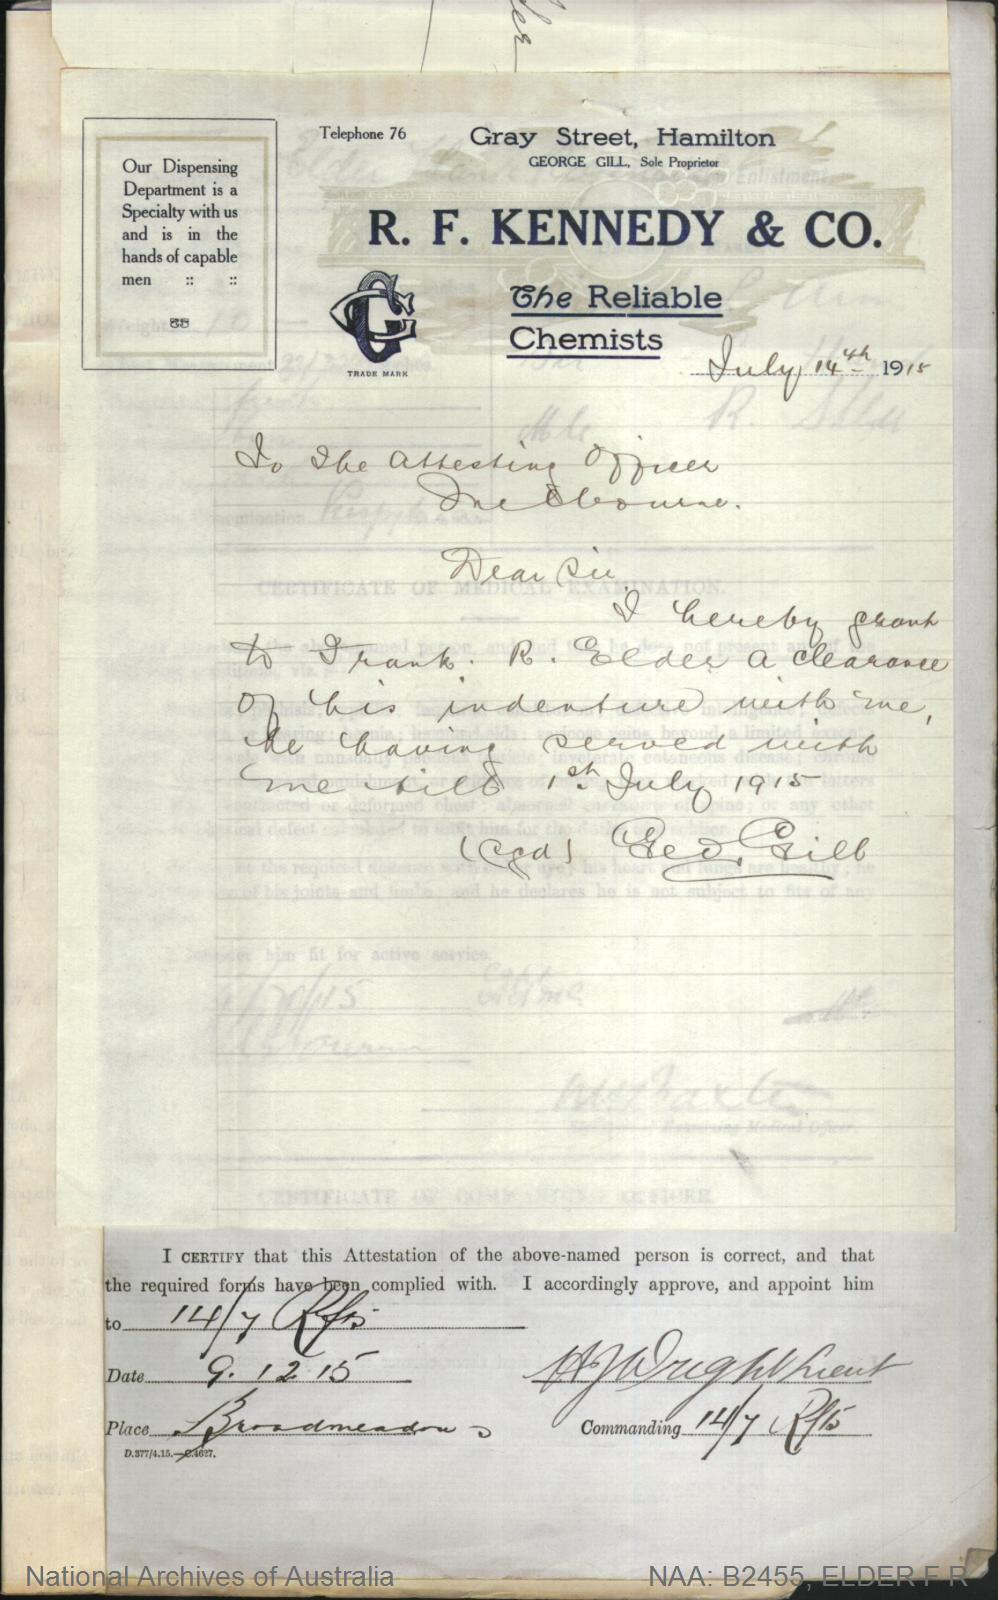 Elder Frank Reginald : SERN 4480 : POB Charlton VIC : POE Melbourne VIC : NOK Elder Mr R A